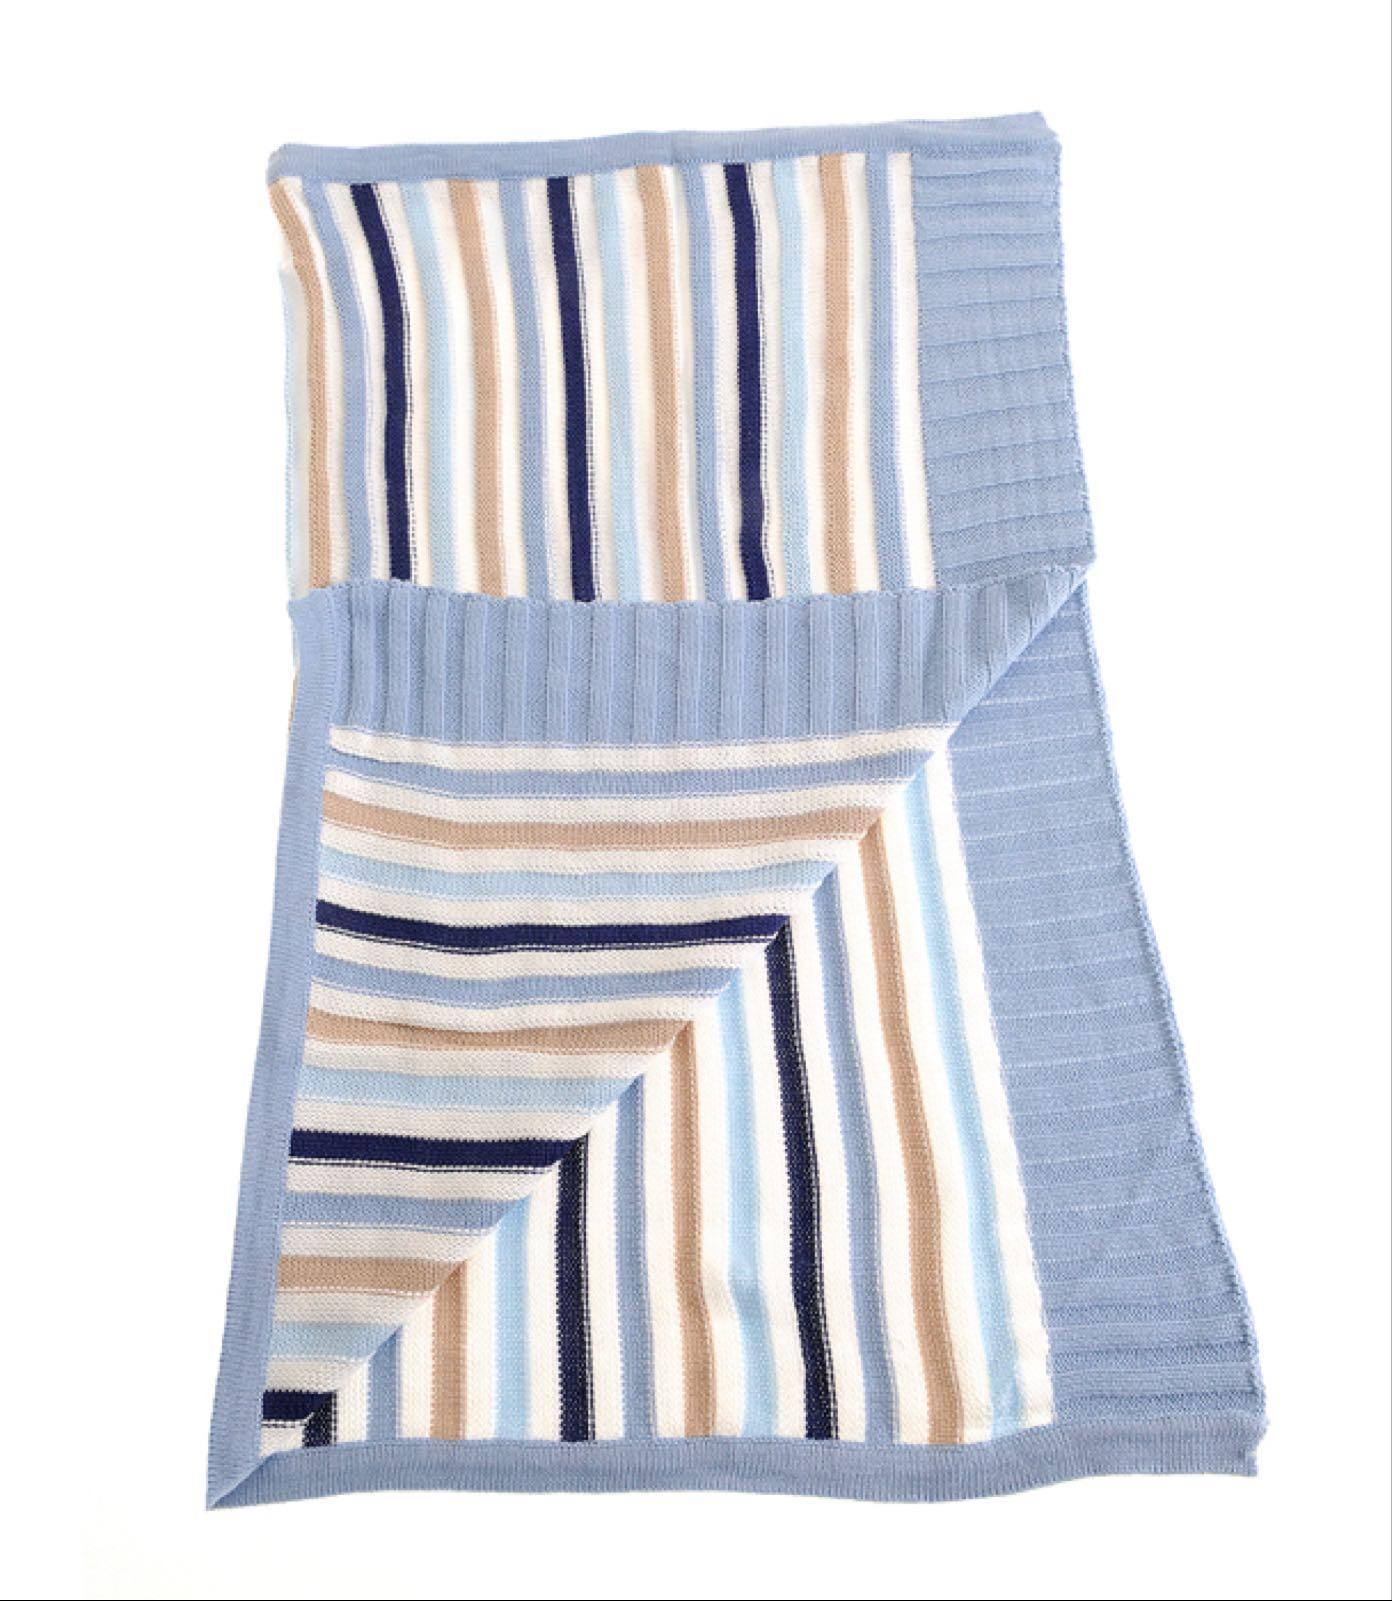 Ziggle Blue & Beige Stripes Blanket